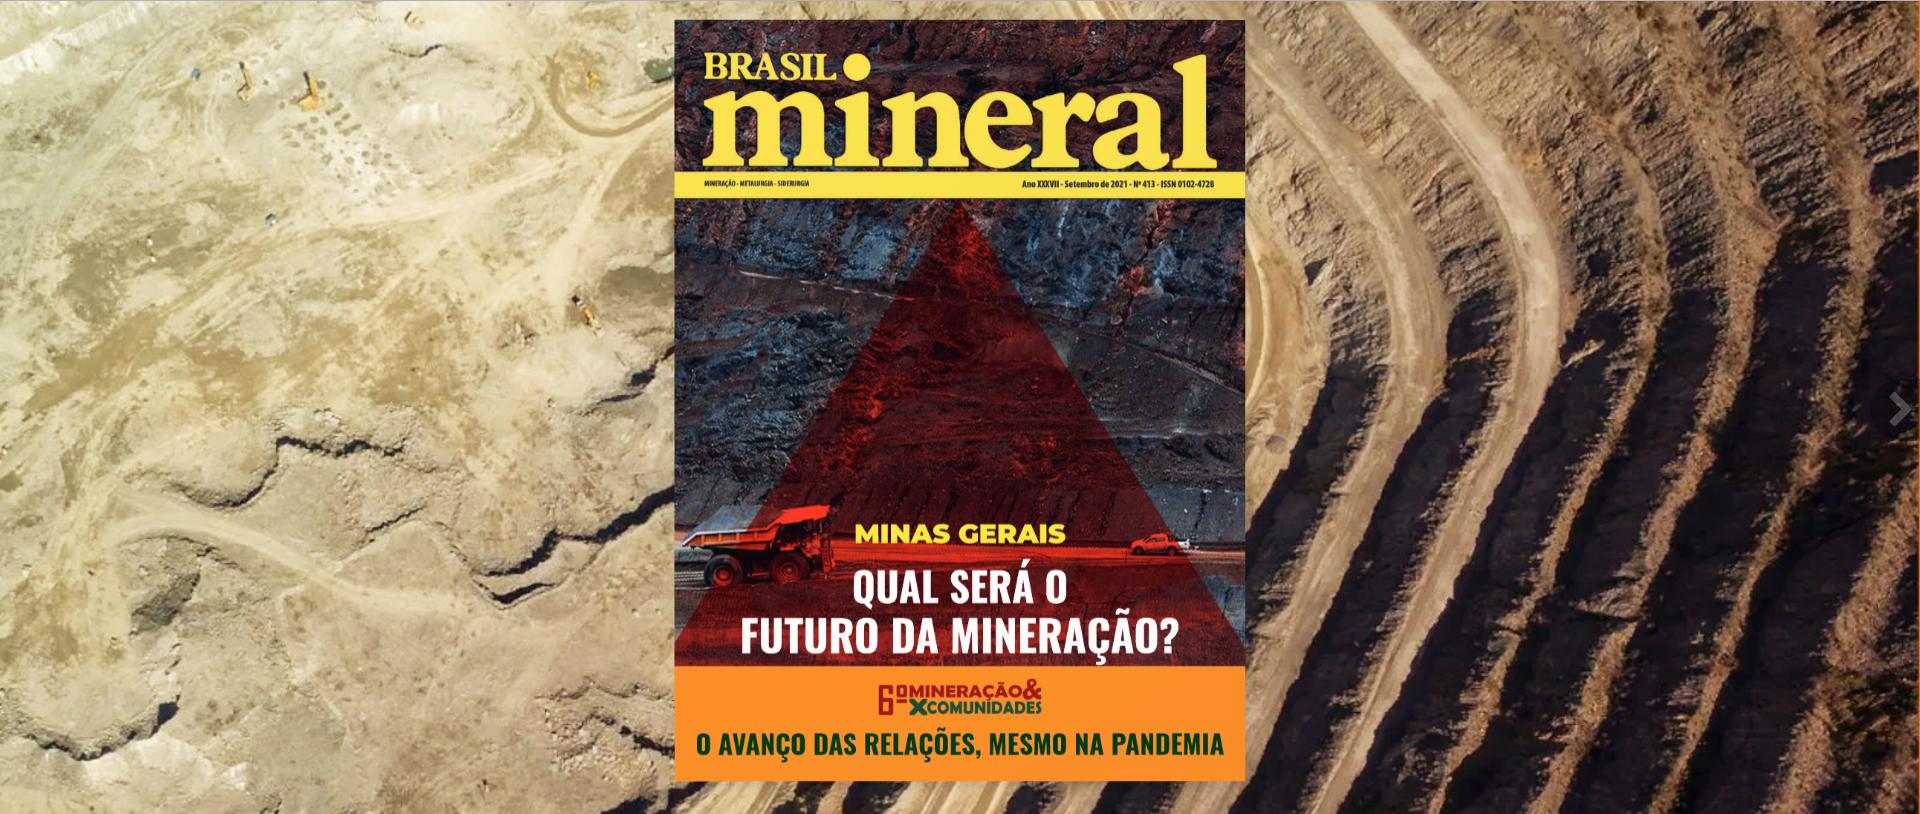 Reportagem na revista Brasil Mineral